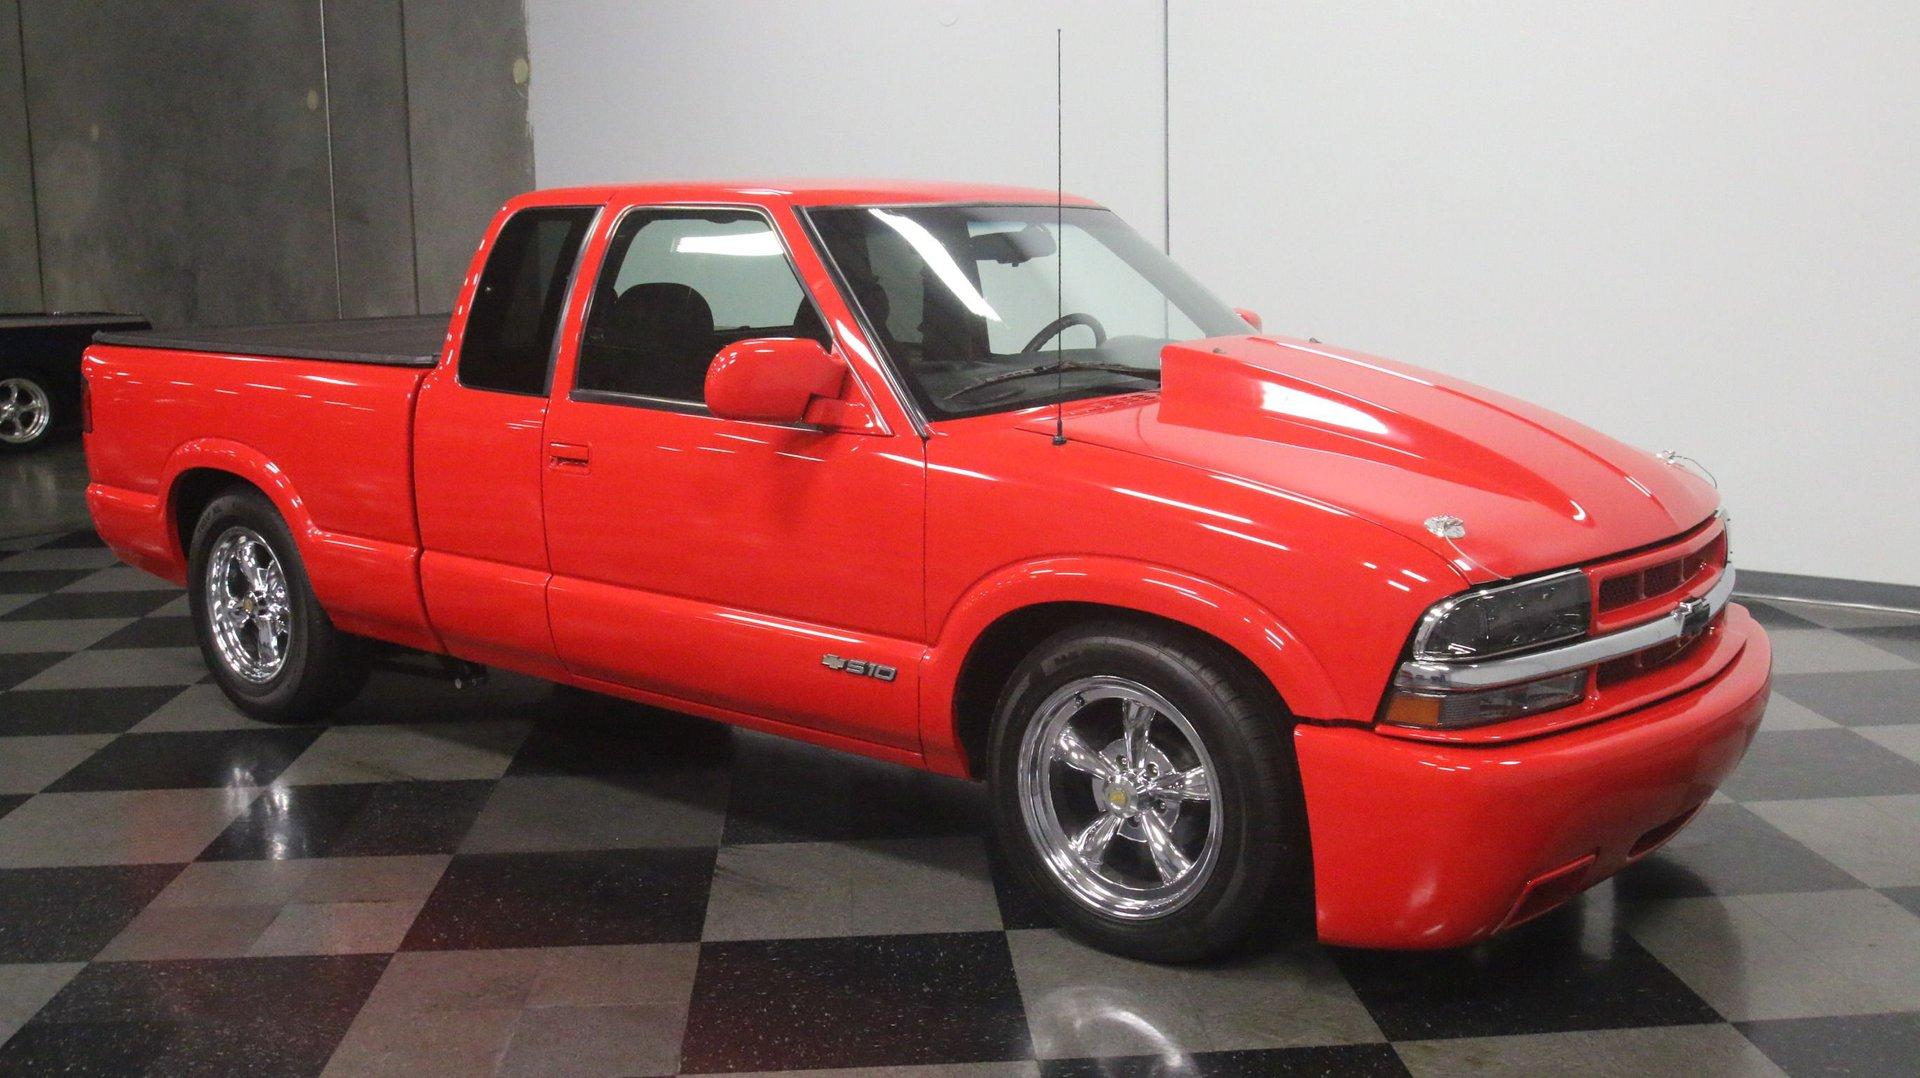 2000 Chevrolet S-10 | Streetside Classics - The Nation's